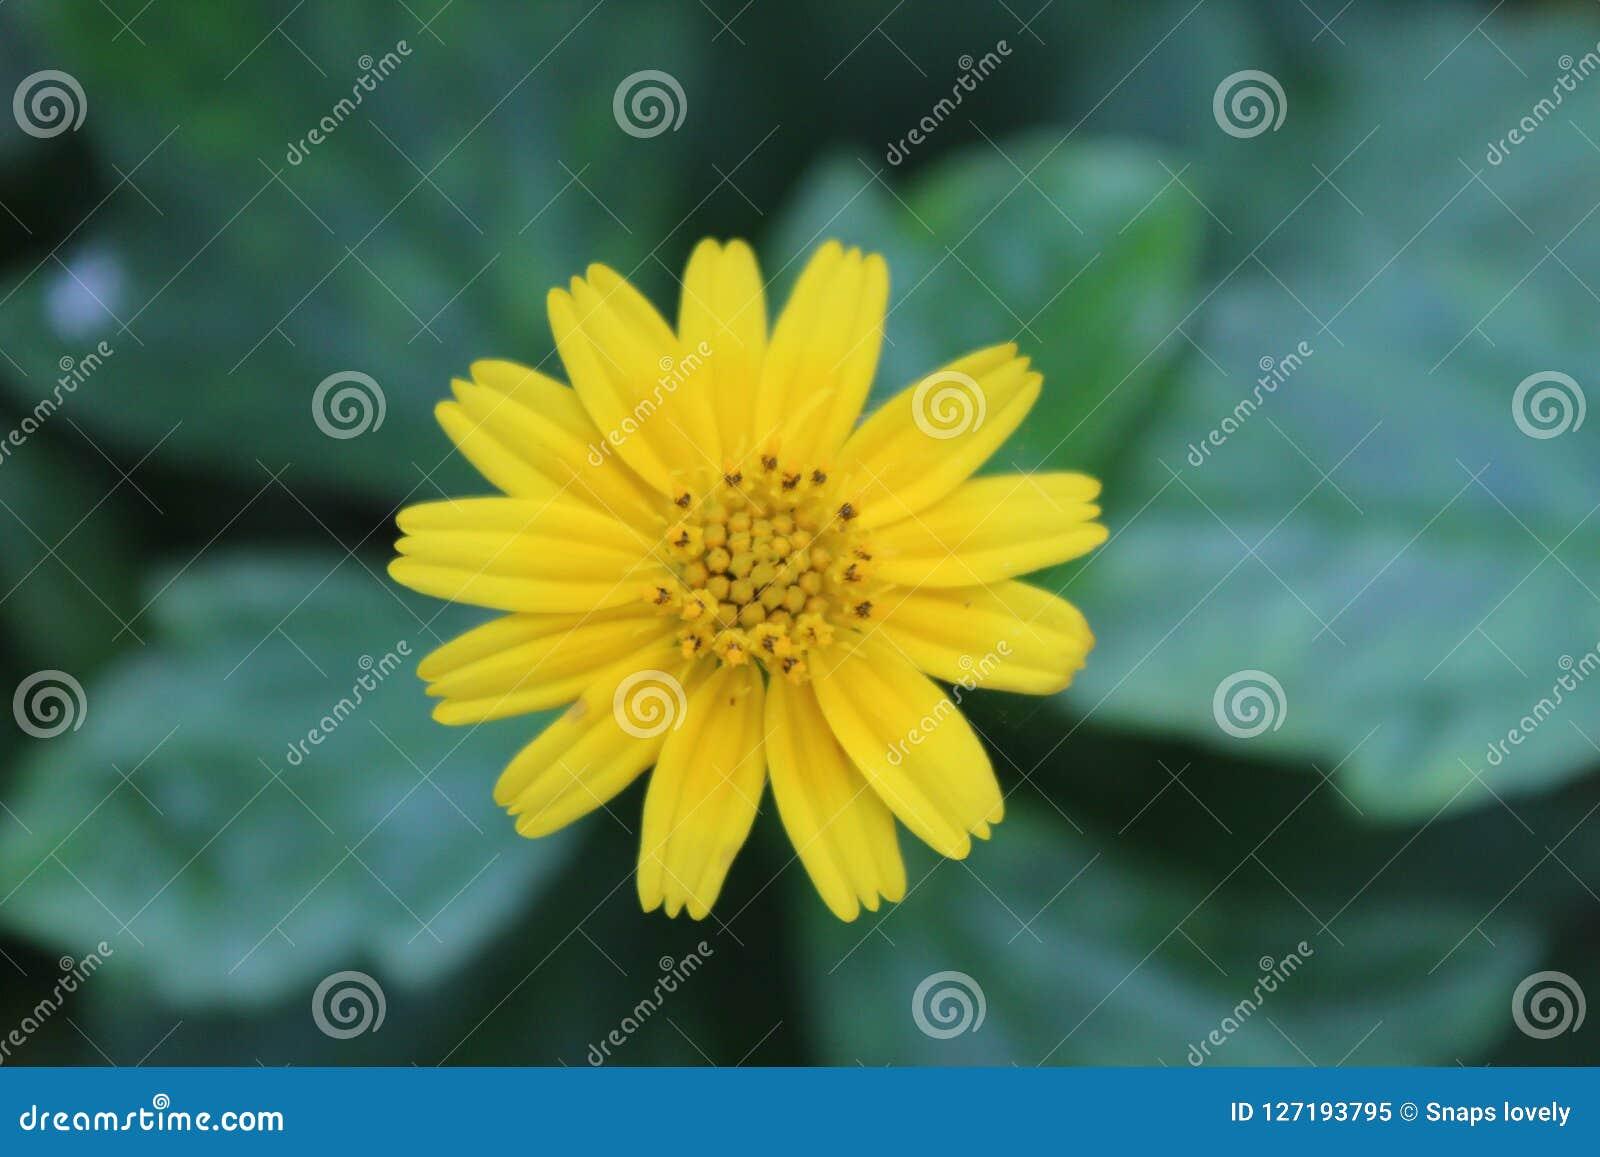 Yellow beautiful flowers stock image image of flowers 127193795 yellow beautiful flowers izmirmasajfo